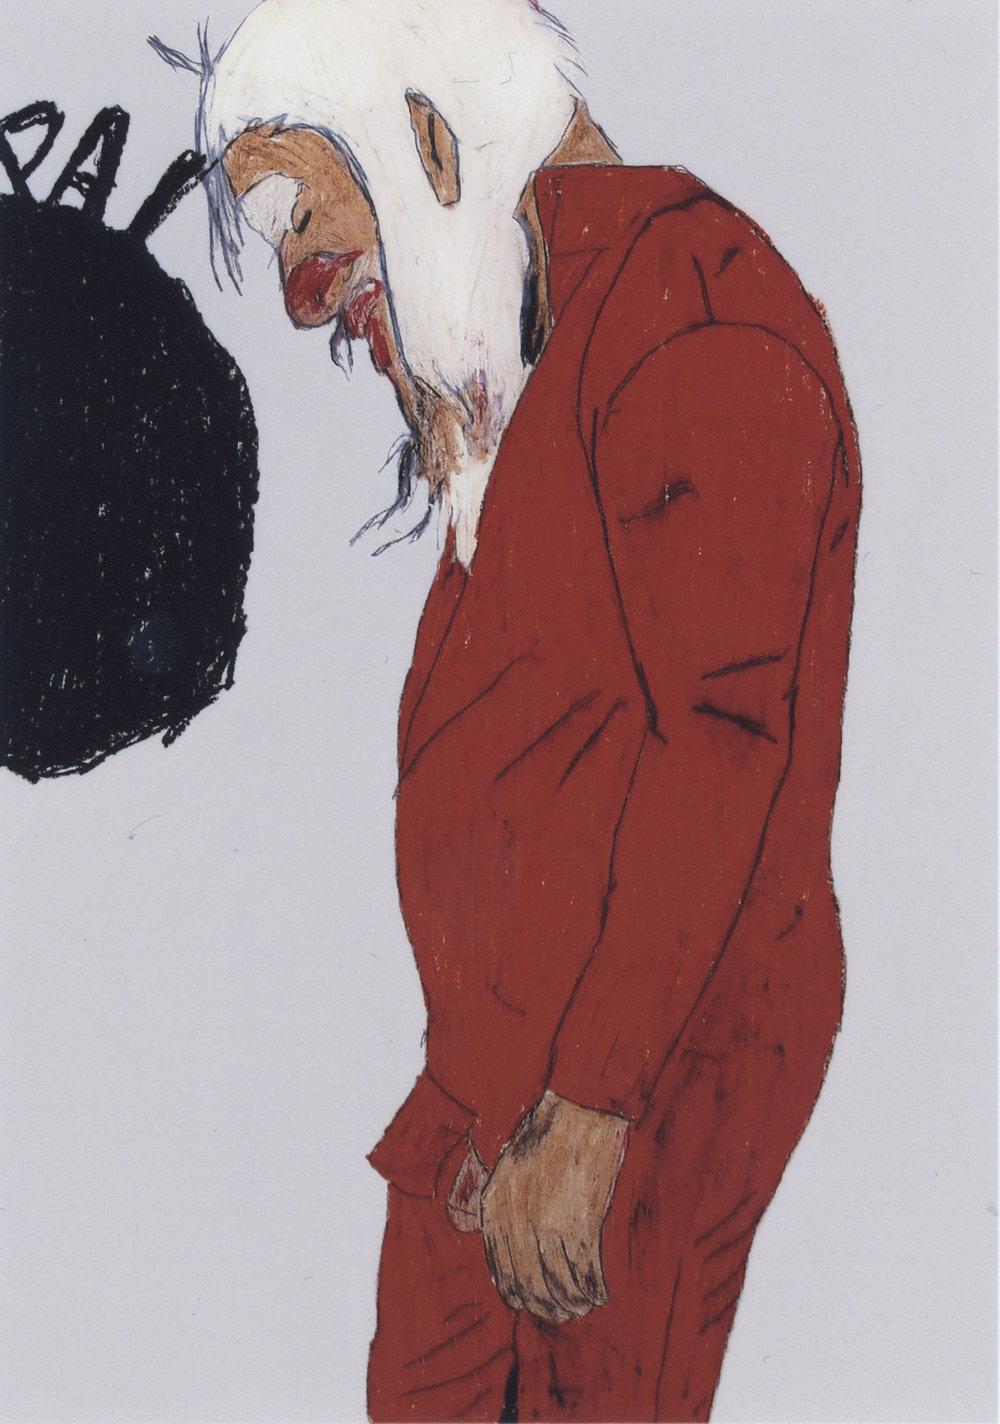 P. McCarthy | Wachskreide auf Karton | 2008 | 84 x 59 cm